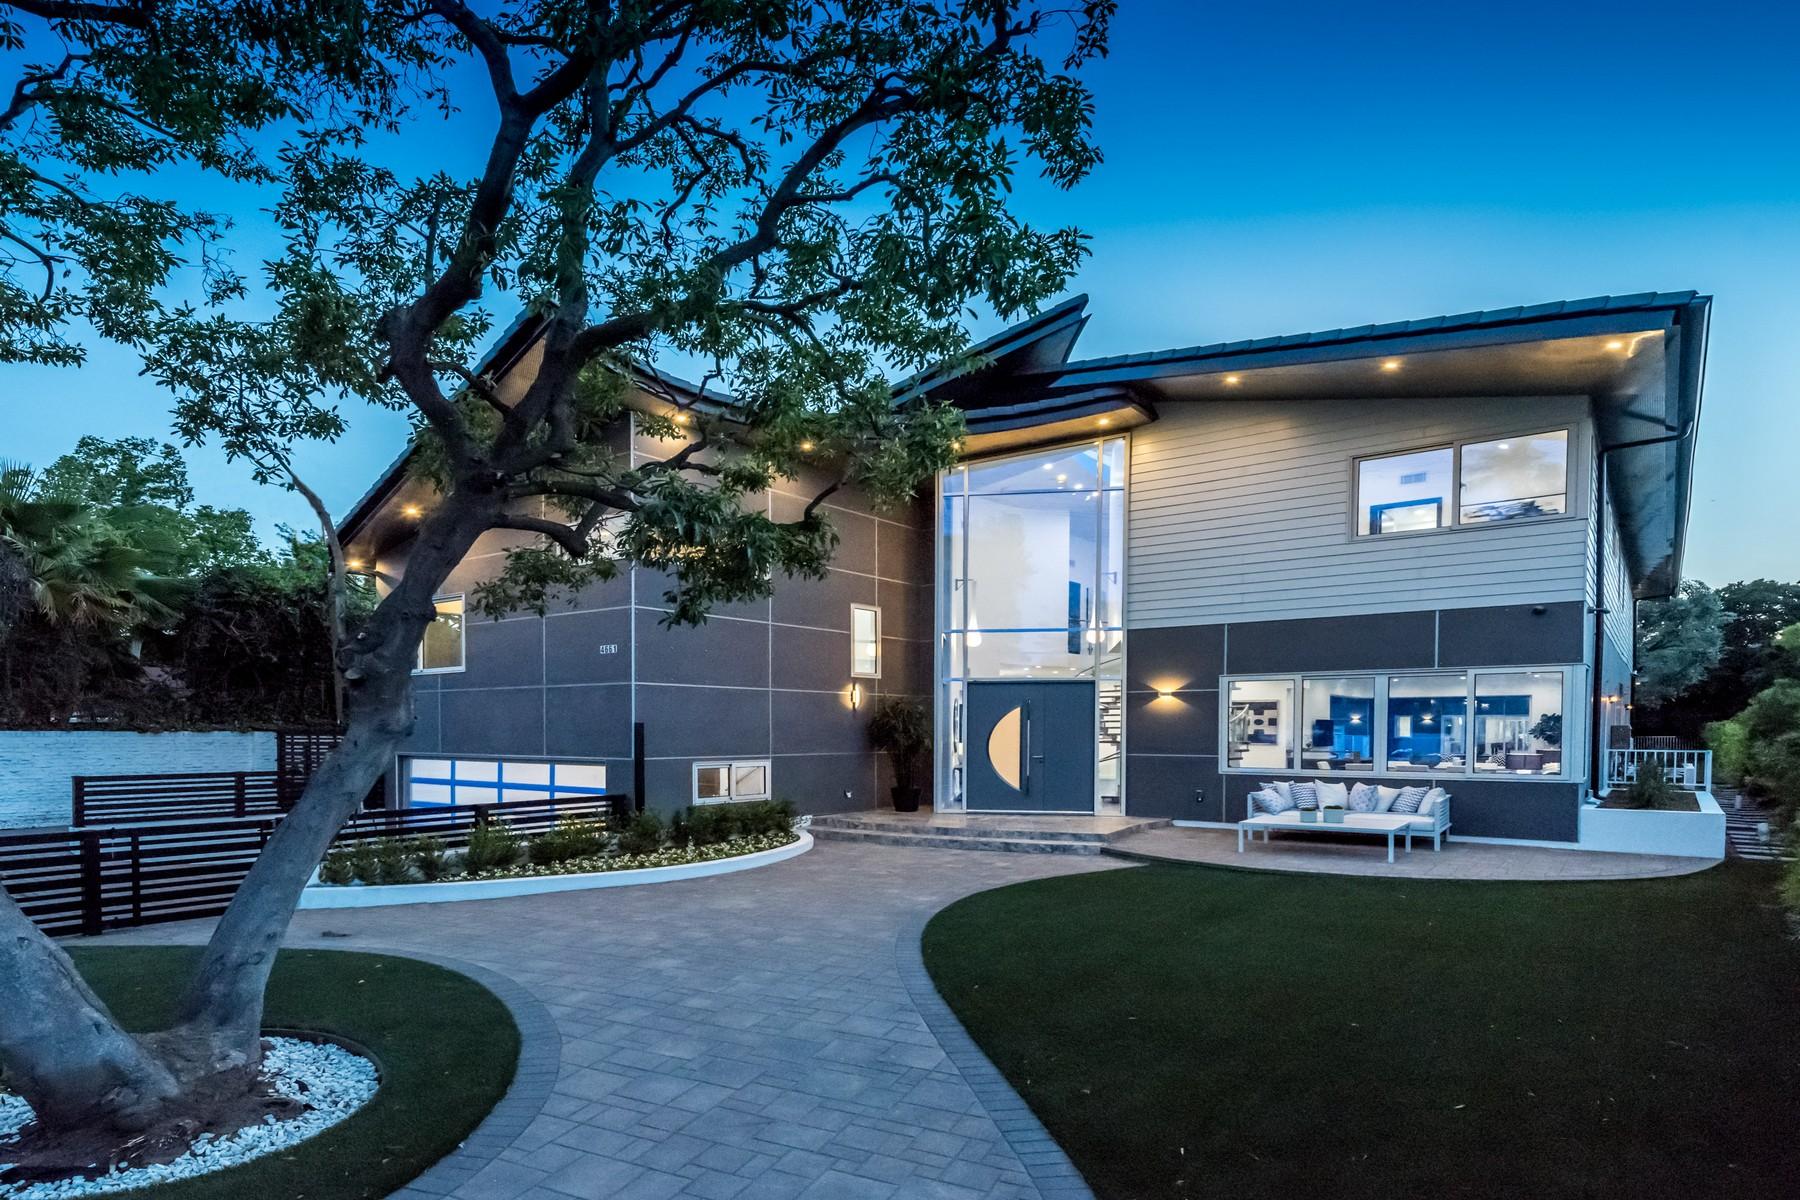 Single Family Home for Sale at 4661 Hayvenhurst Ave Encino, California 91436 United States